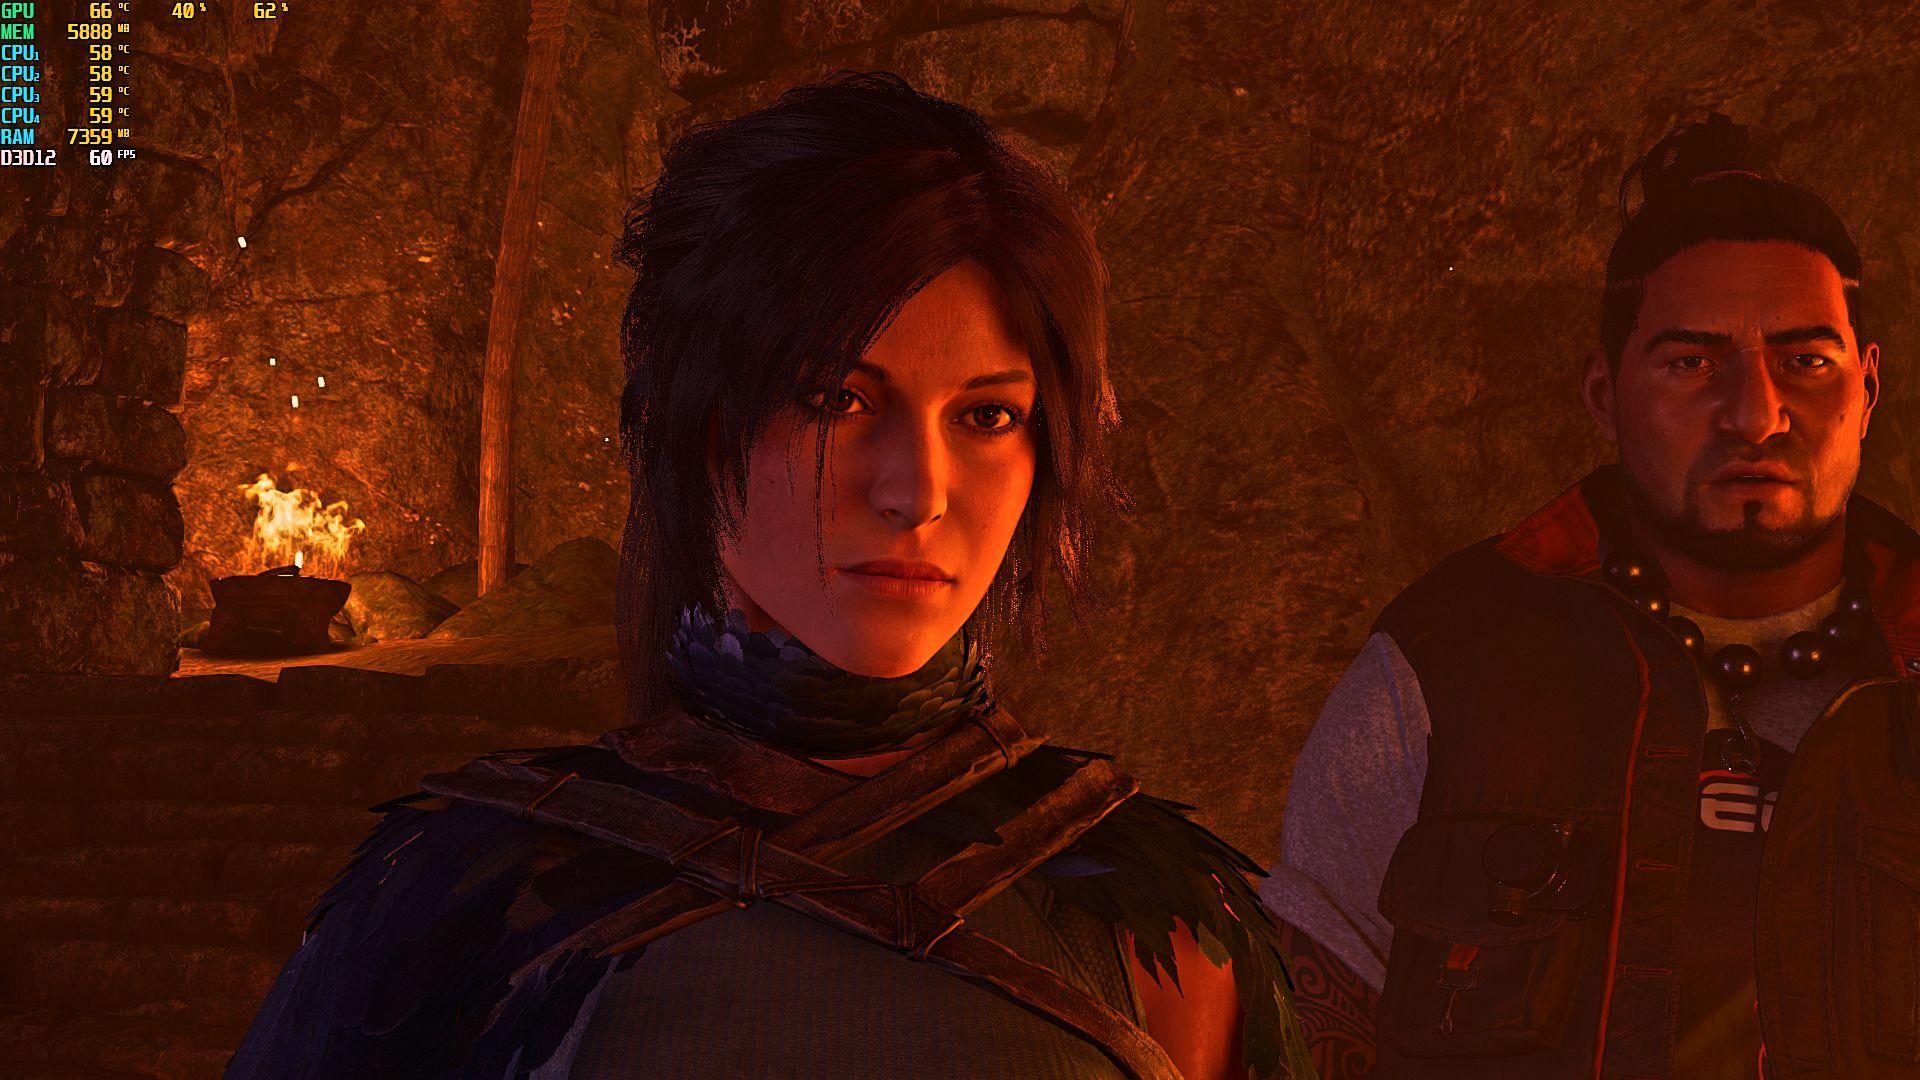 000633.Jpg - Shadow of the Tomb Raider